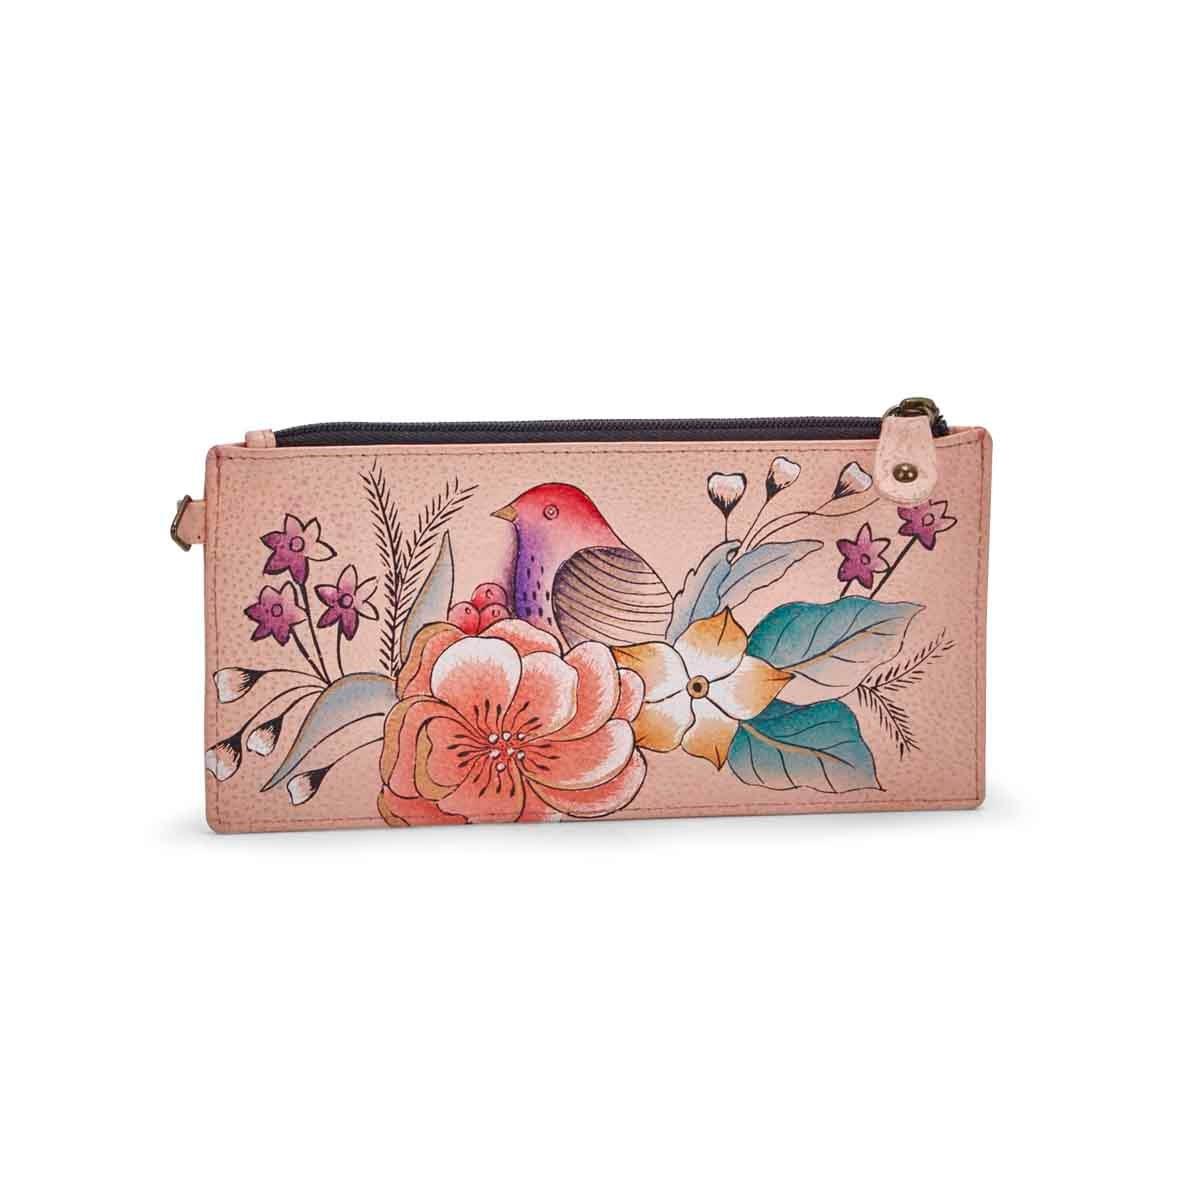 Women's VINTAGE GARDEN wallet